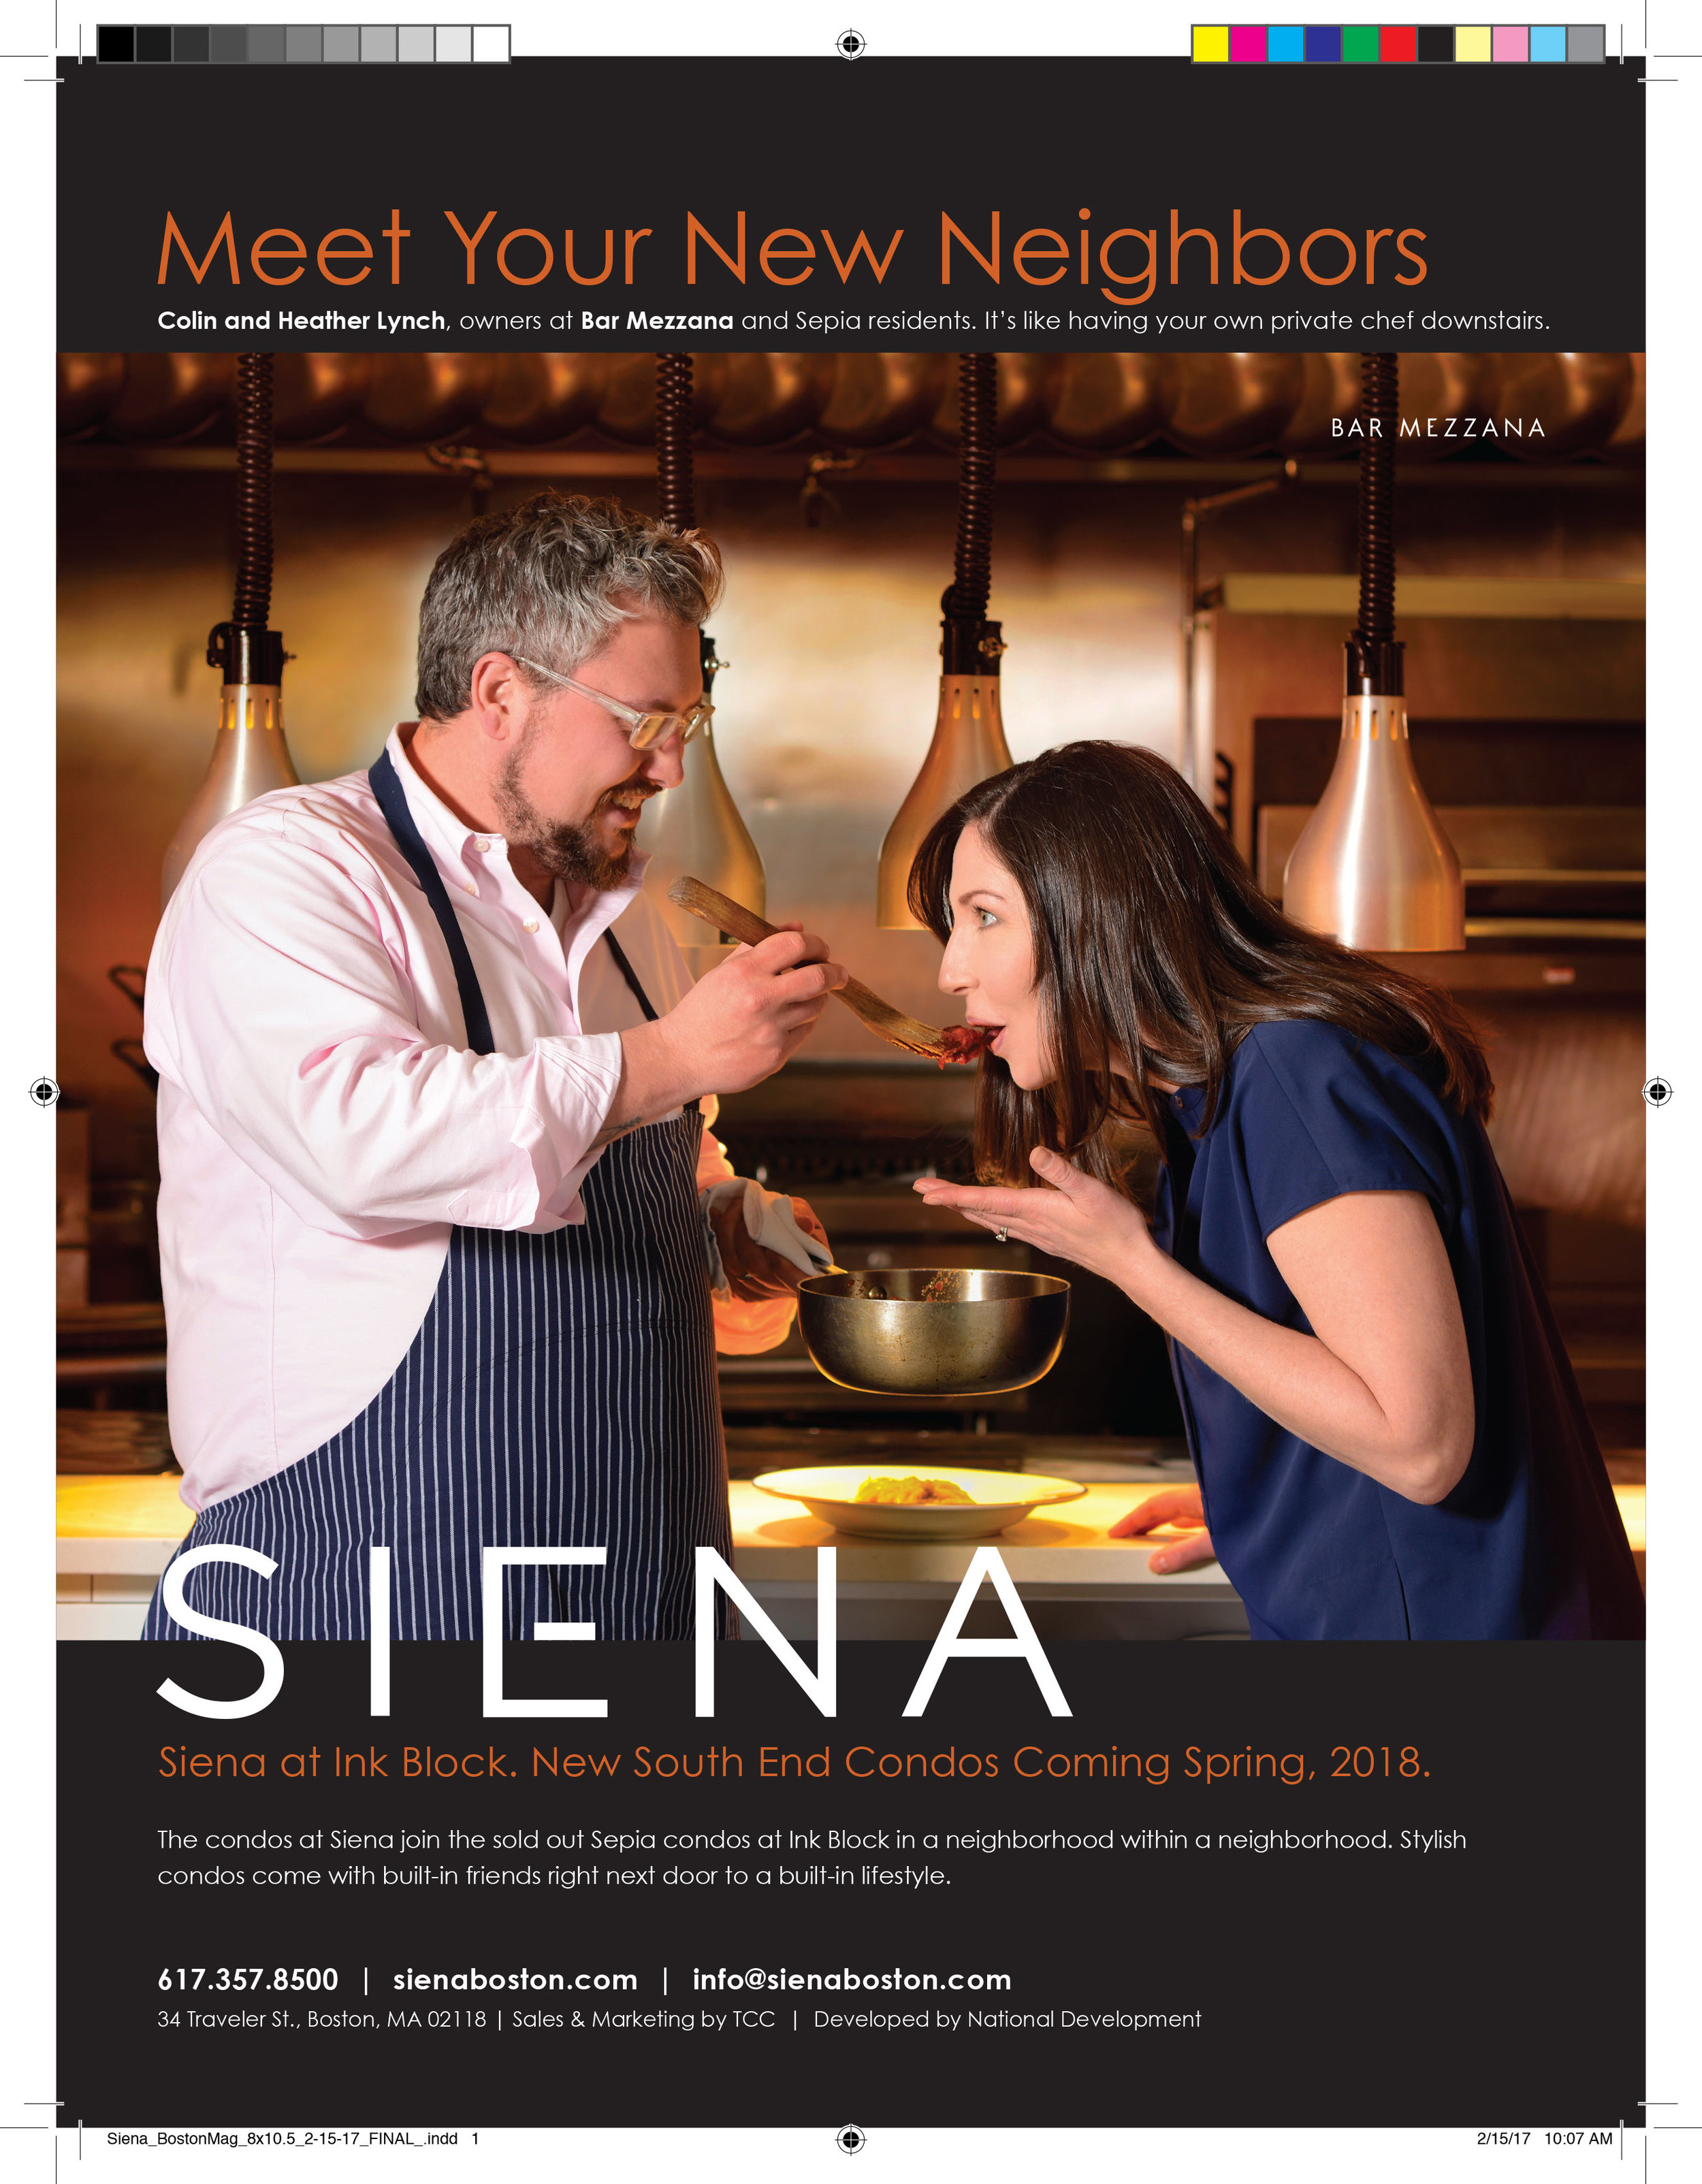 Boston Magazine Ad - Siena at Ink Block Boston  Meet your neighbors ad campaign for development company Siena